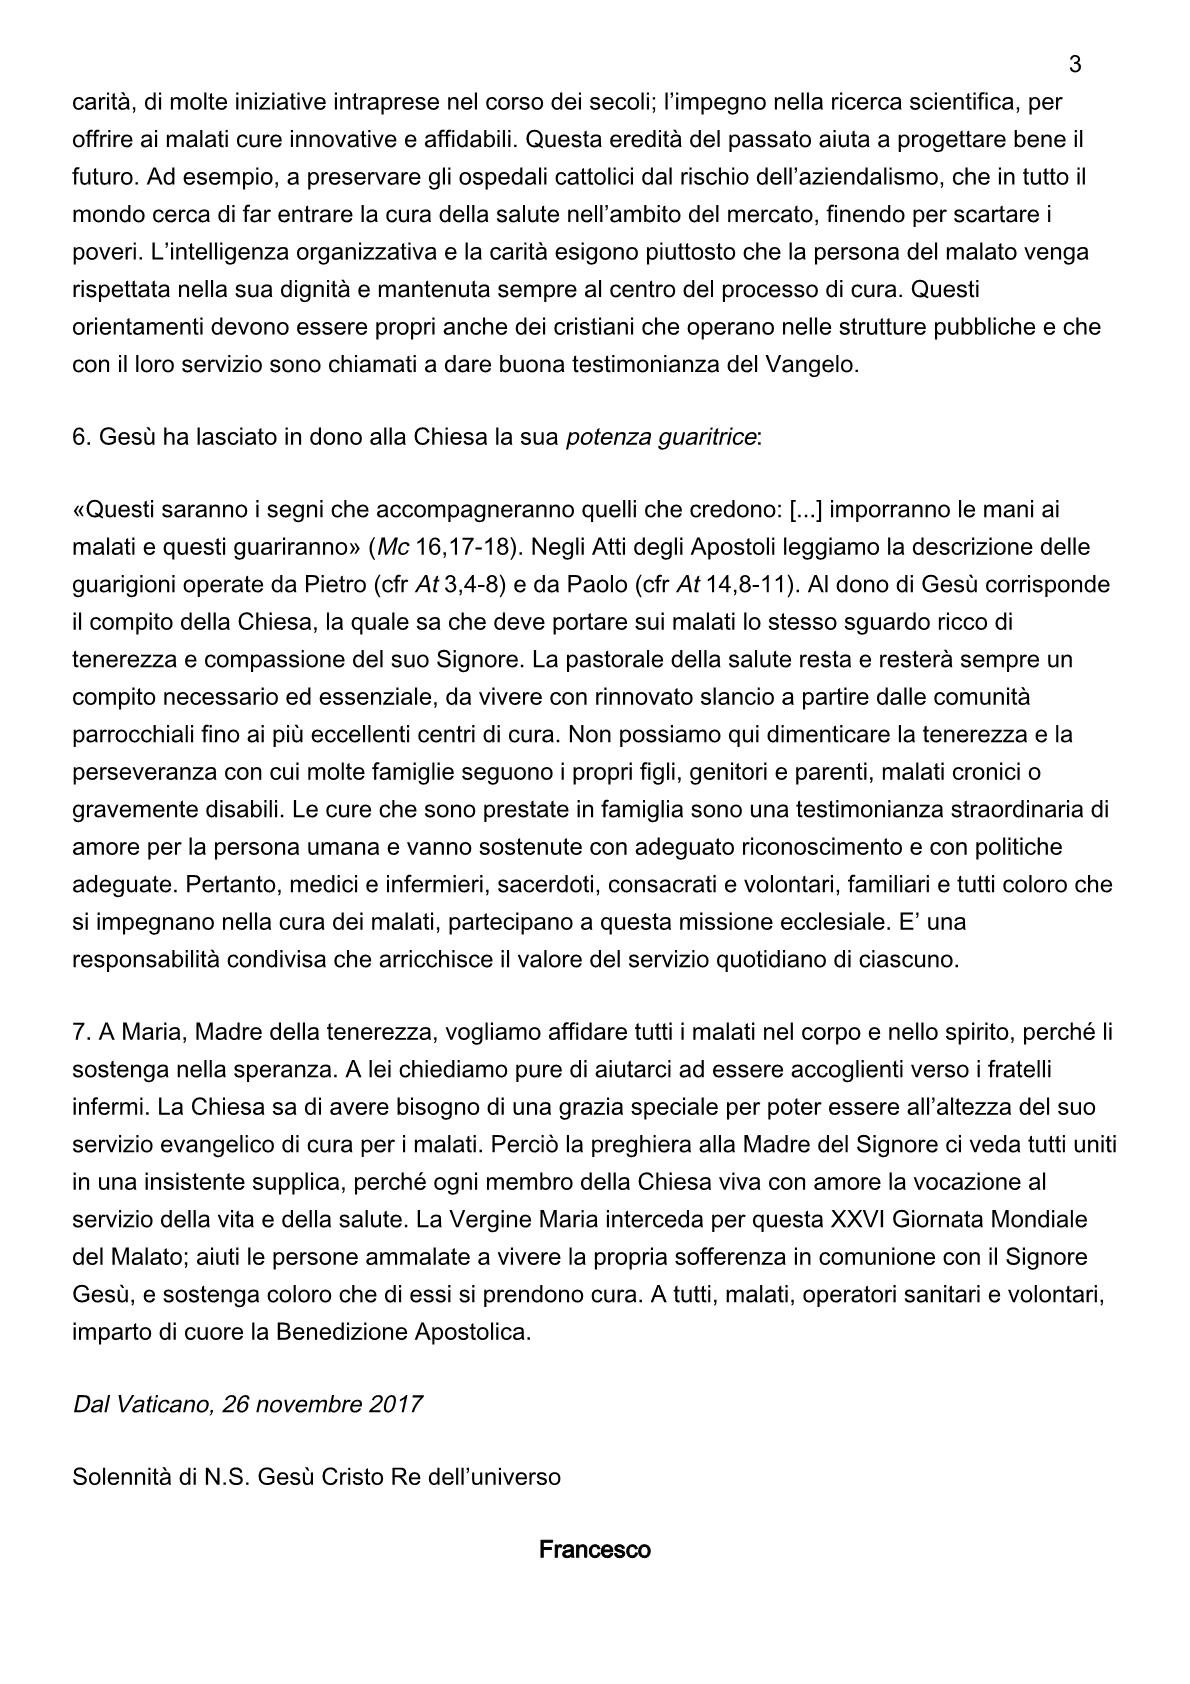 papa-francesco_20171126_giornata-malato3